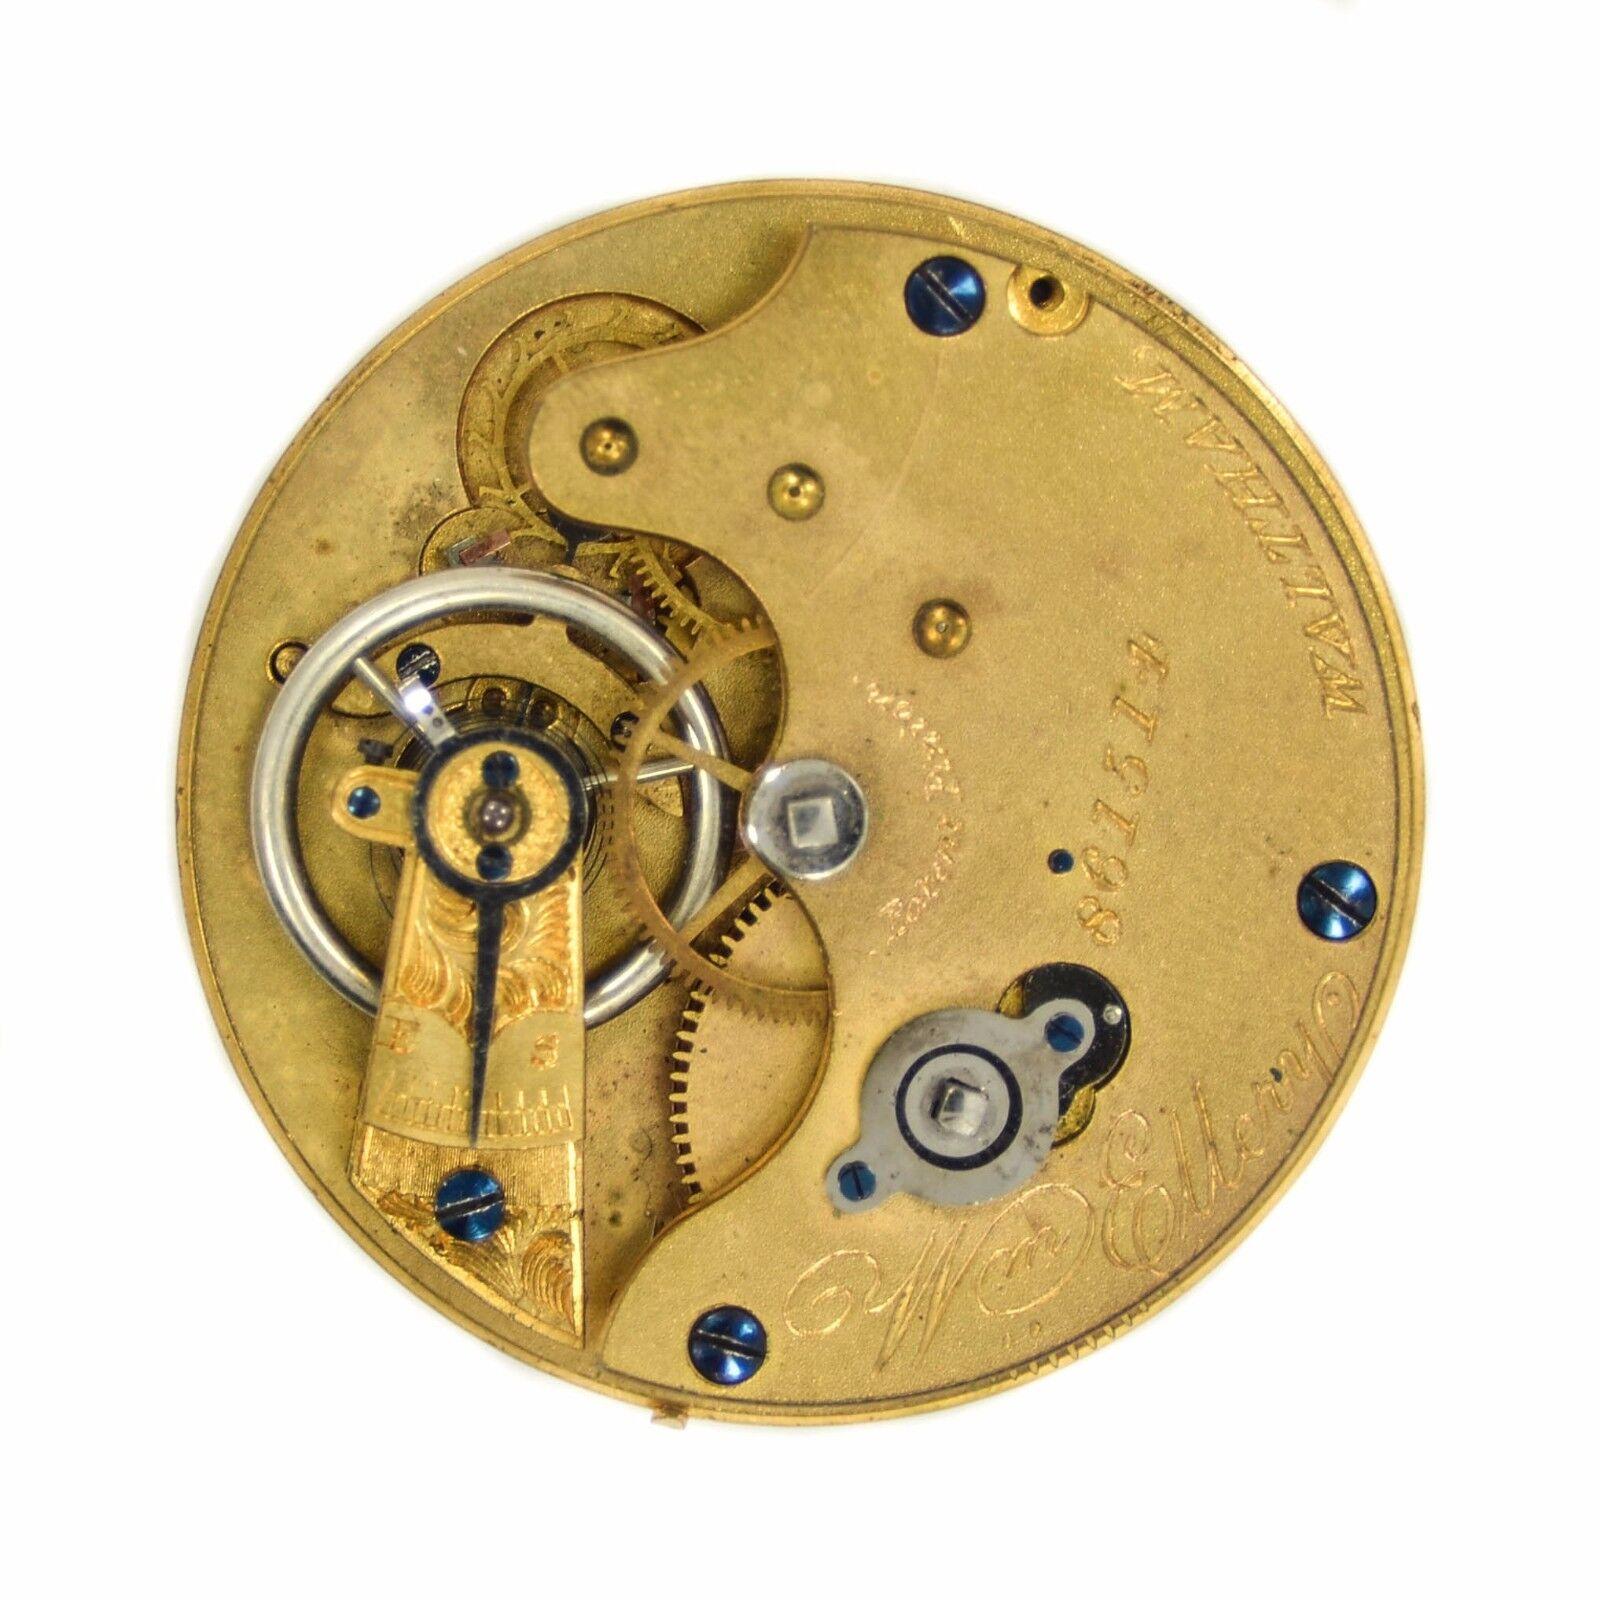 Vintage American Watch Co.Pocket Watch Patent Pinion Movement 861514 38mm